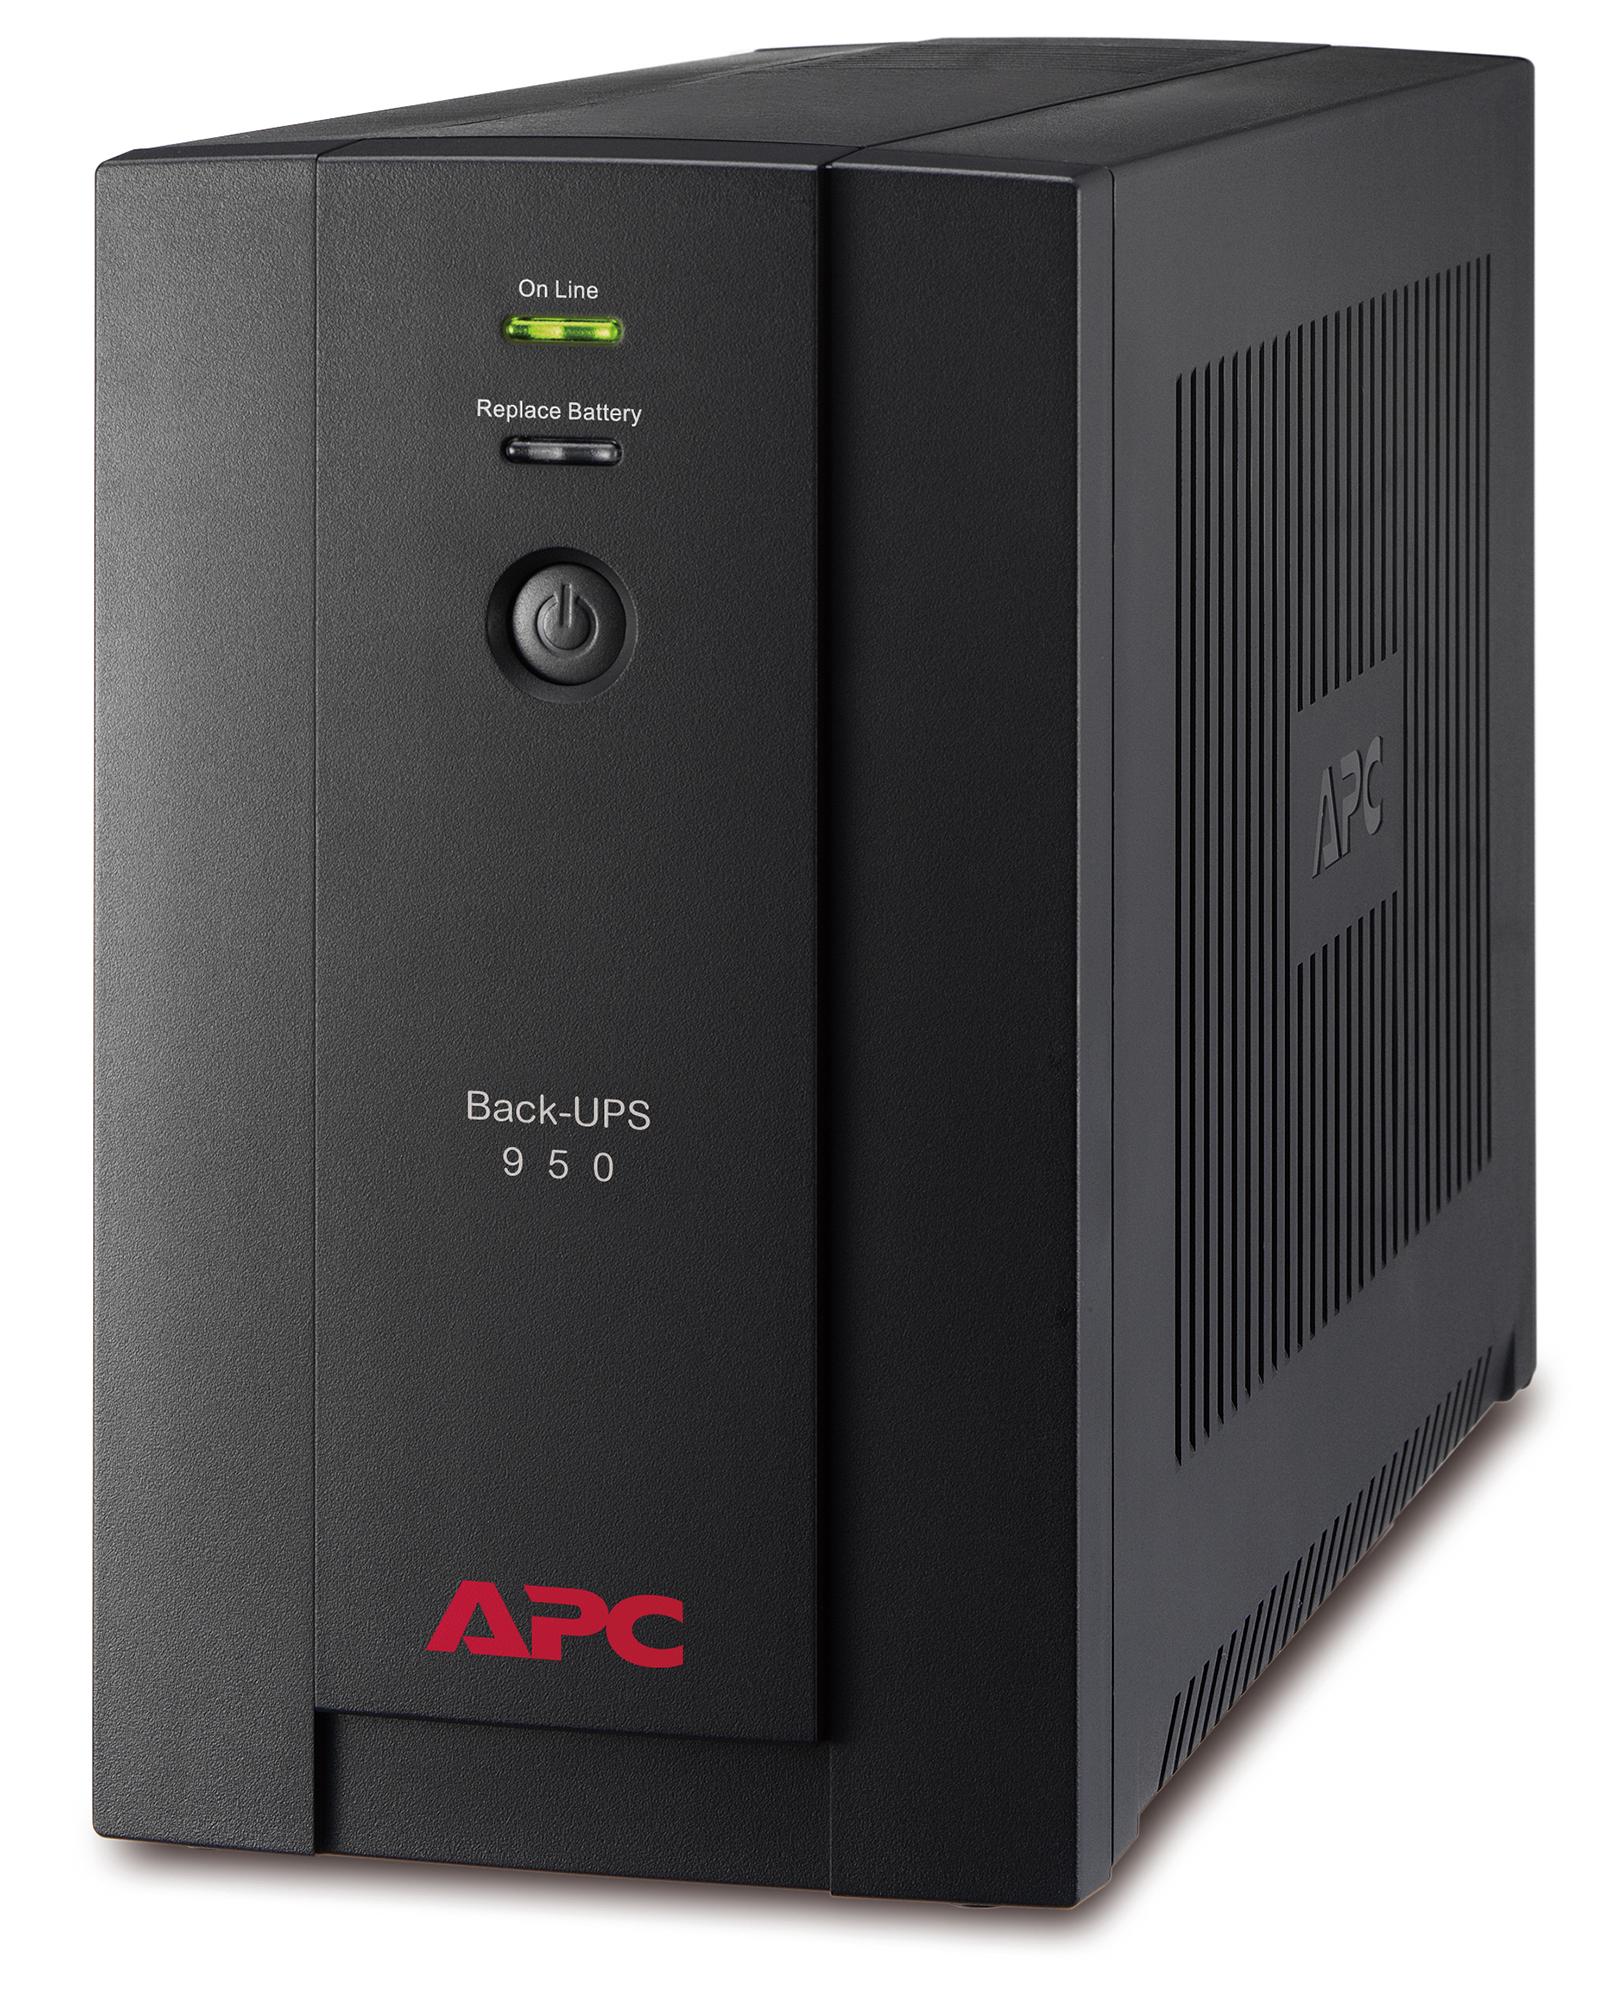 APC Back-UPS Line-Interactive 950 VA 480 W 6 AC outlet(s)